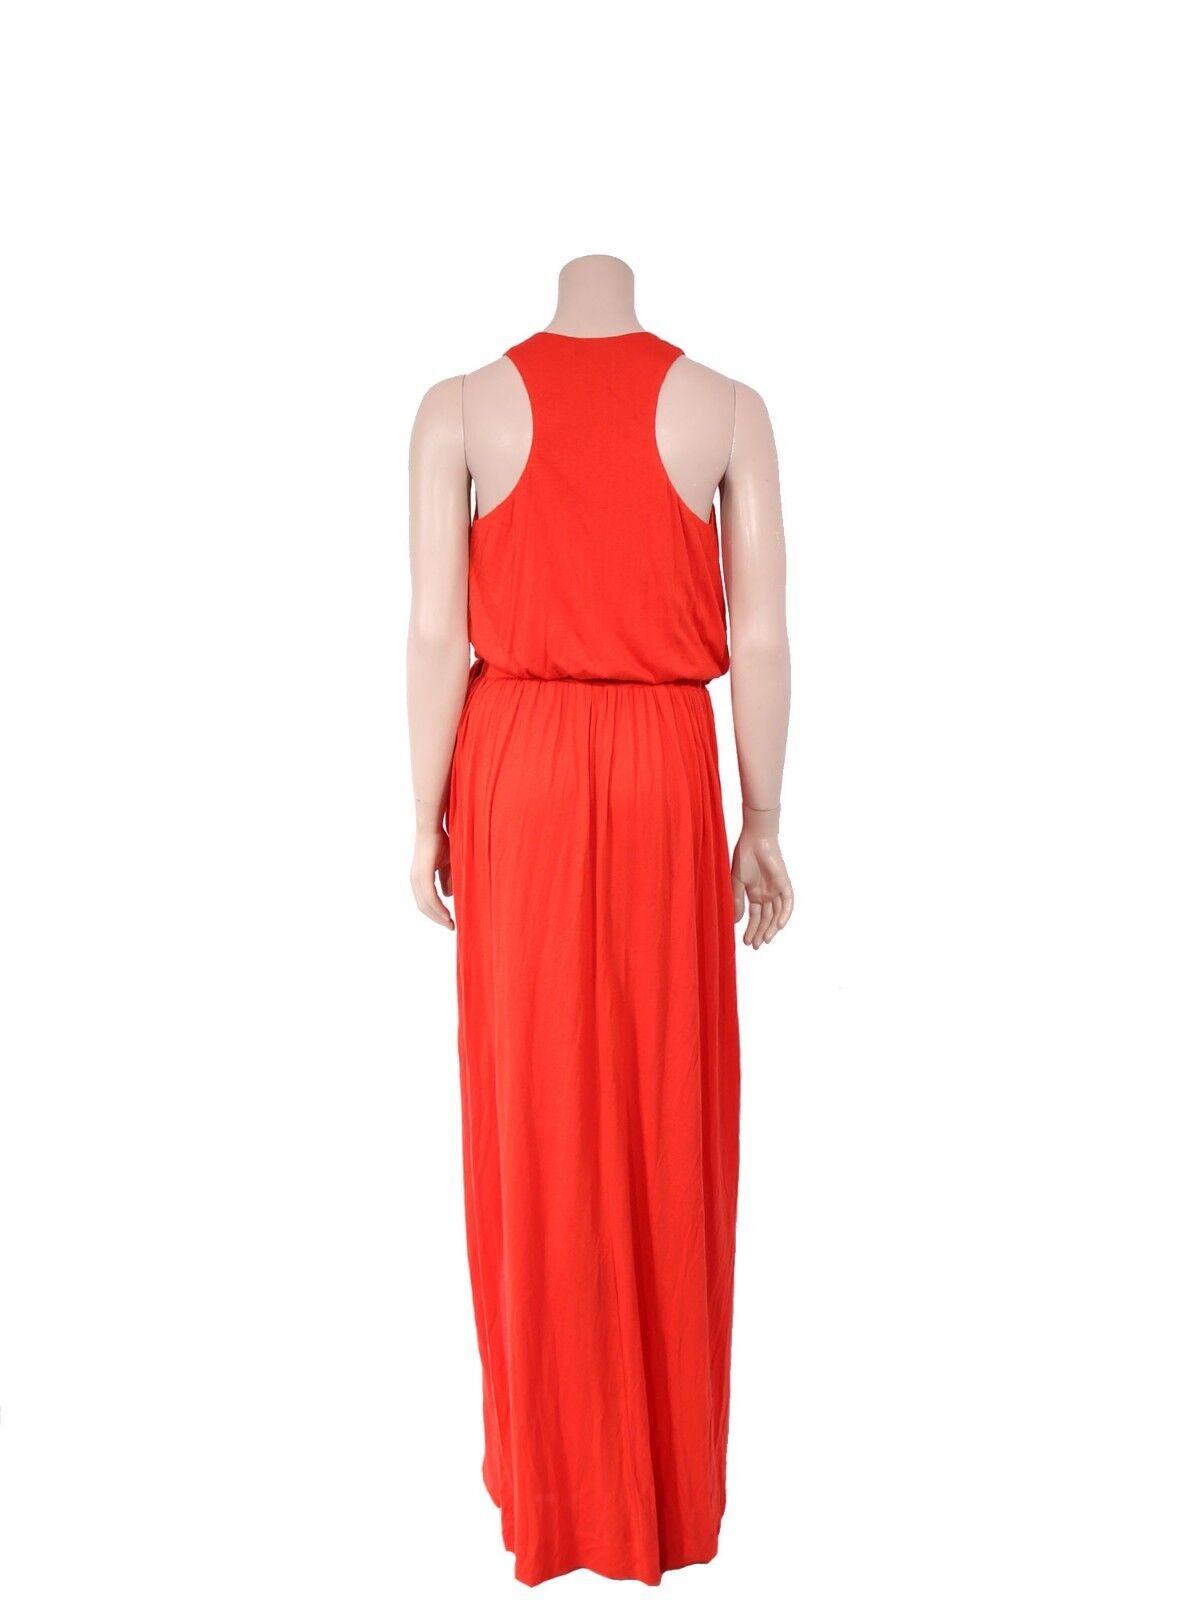 ROBERT RODRIGUEZ RODRIGUEZ RODRIGUEZ orange Maxi Dress (size small) 6e8474